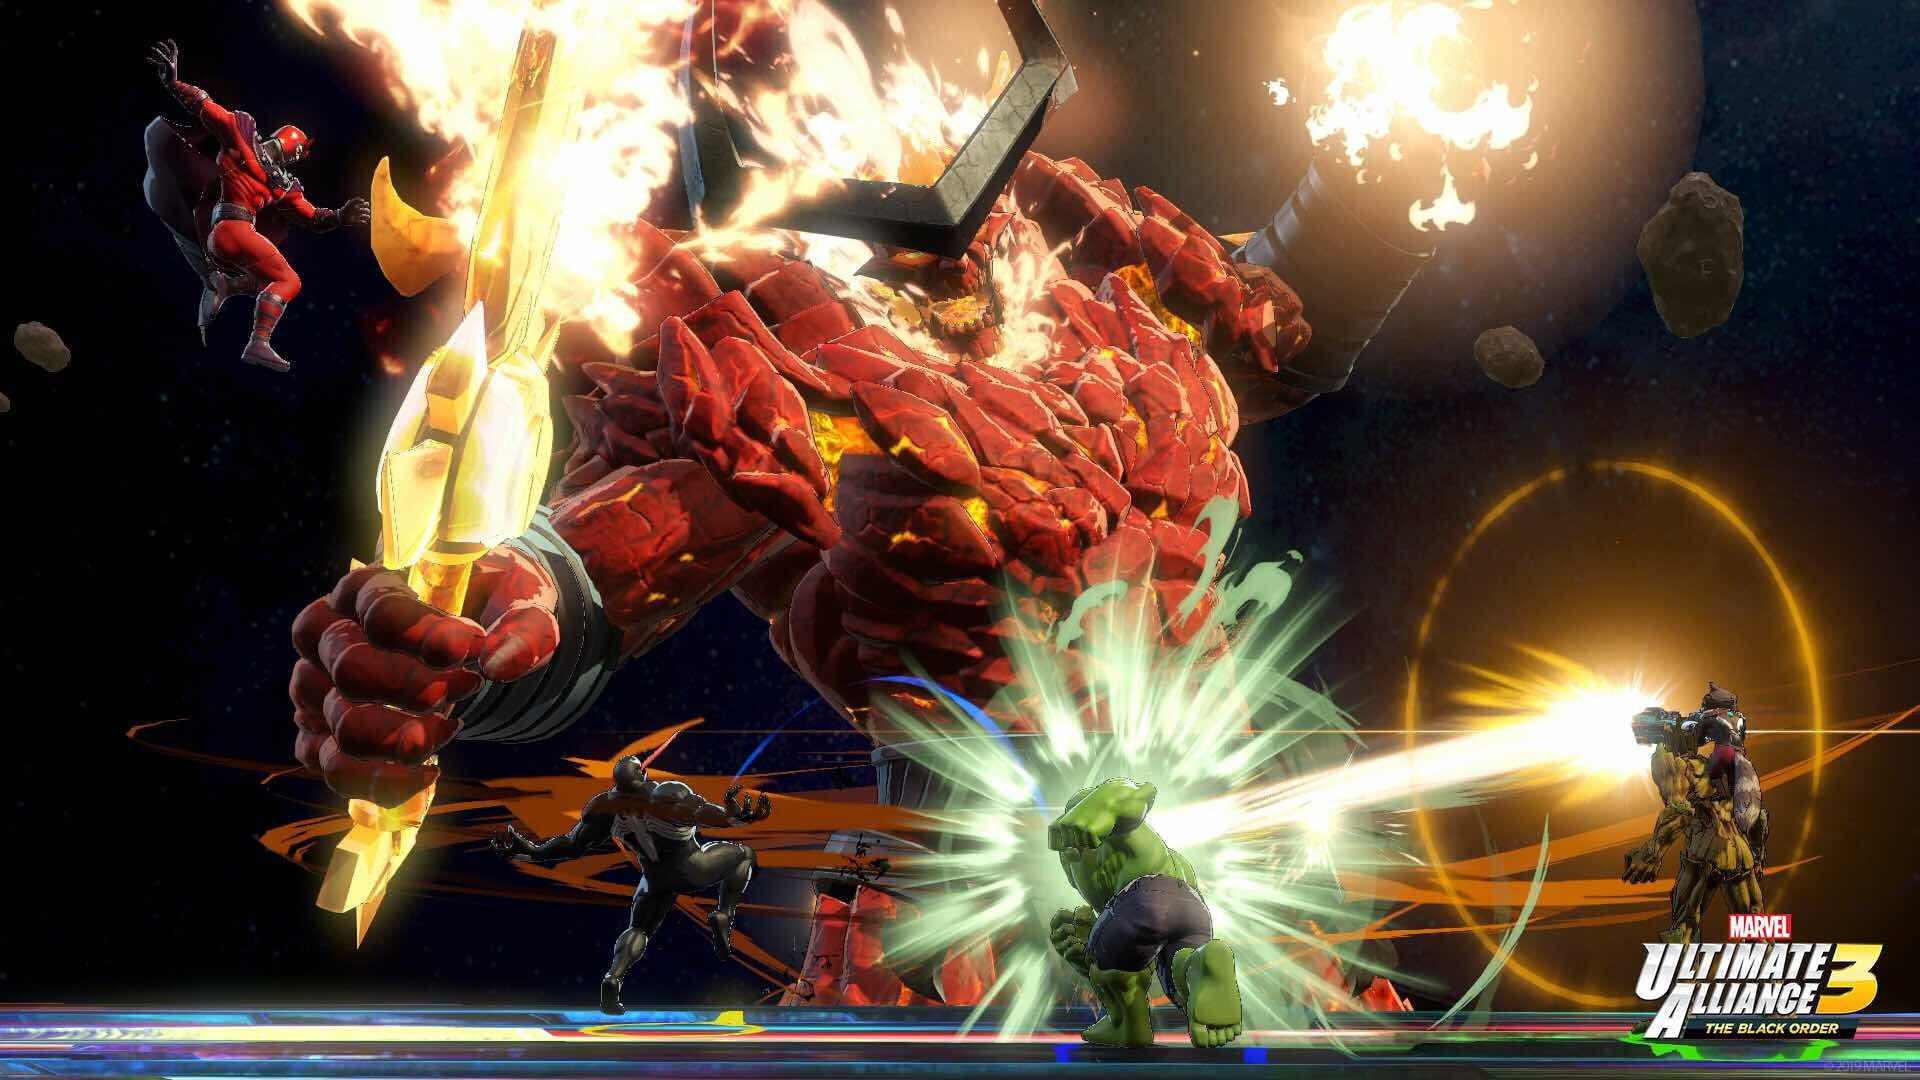 marvel-ultimate-alliance-3-the-black-order-for-nintendo-switch-3